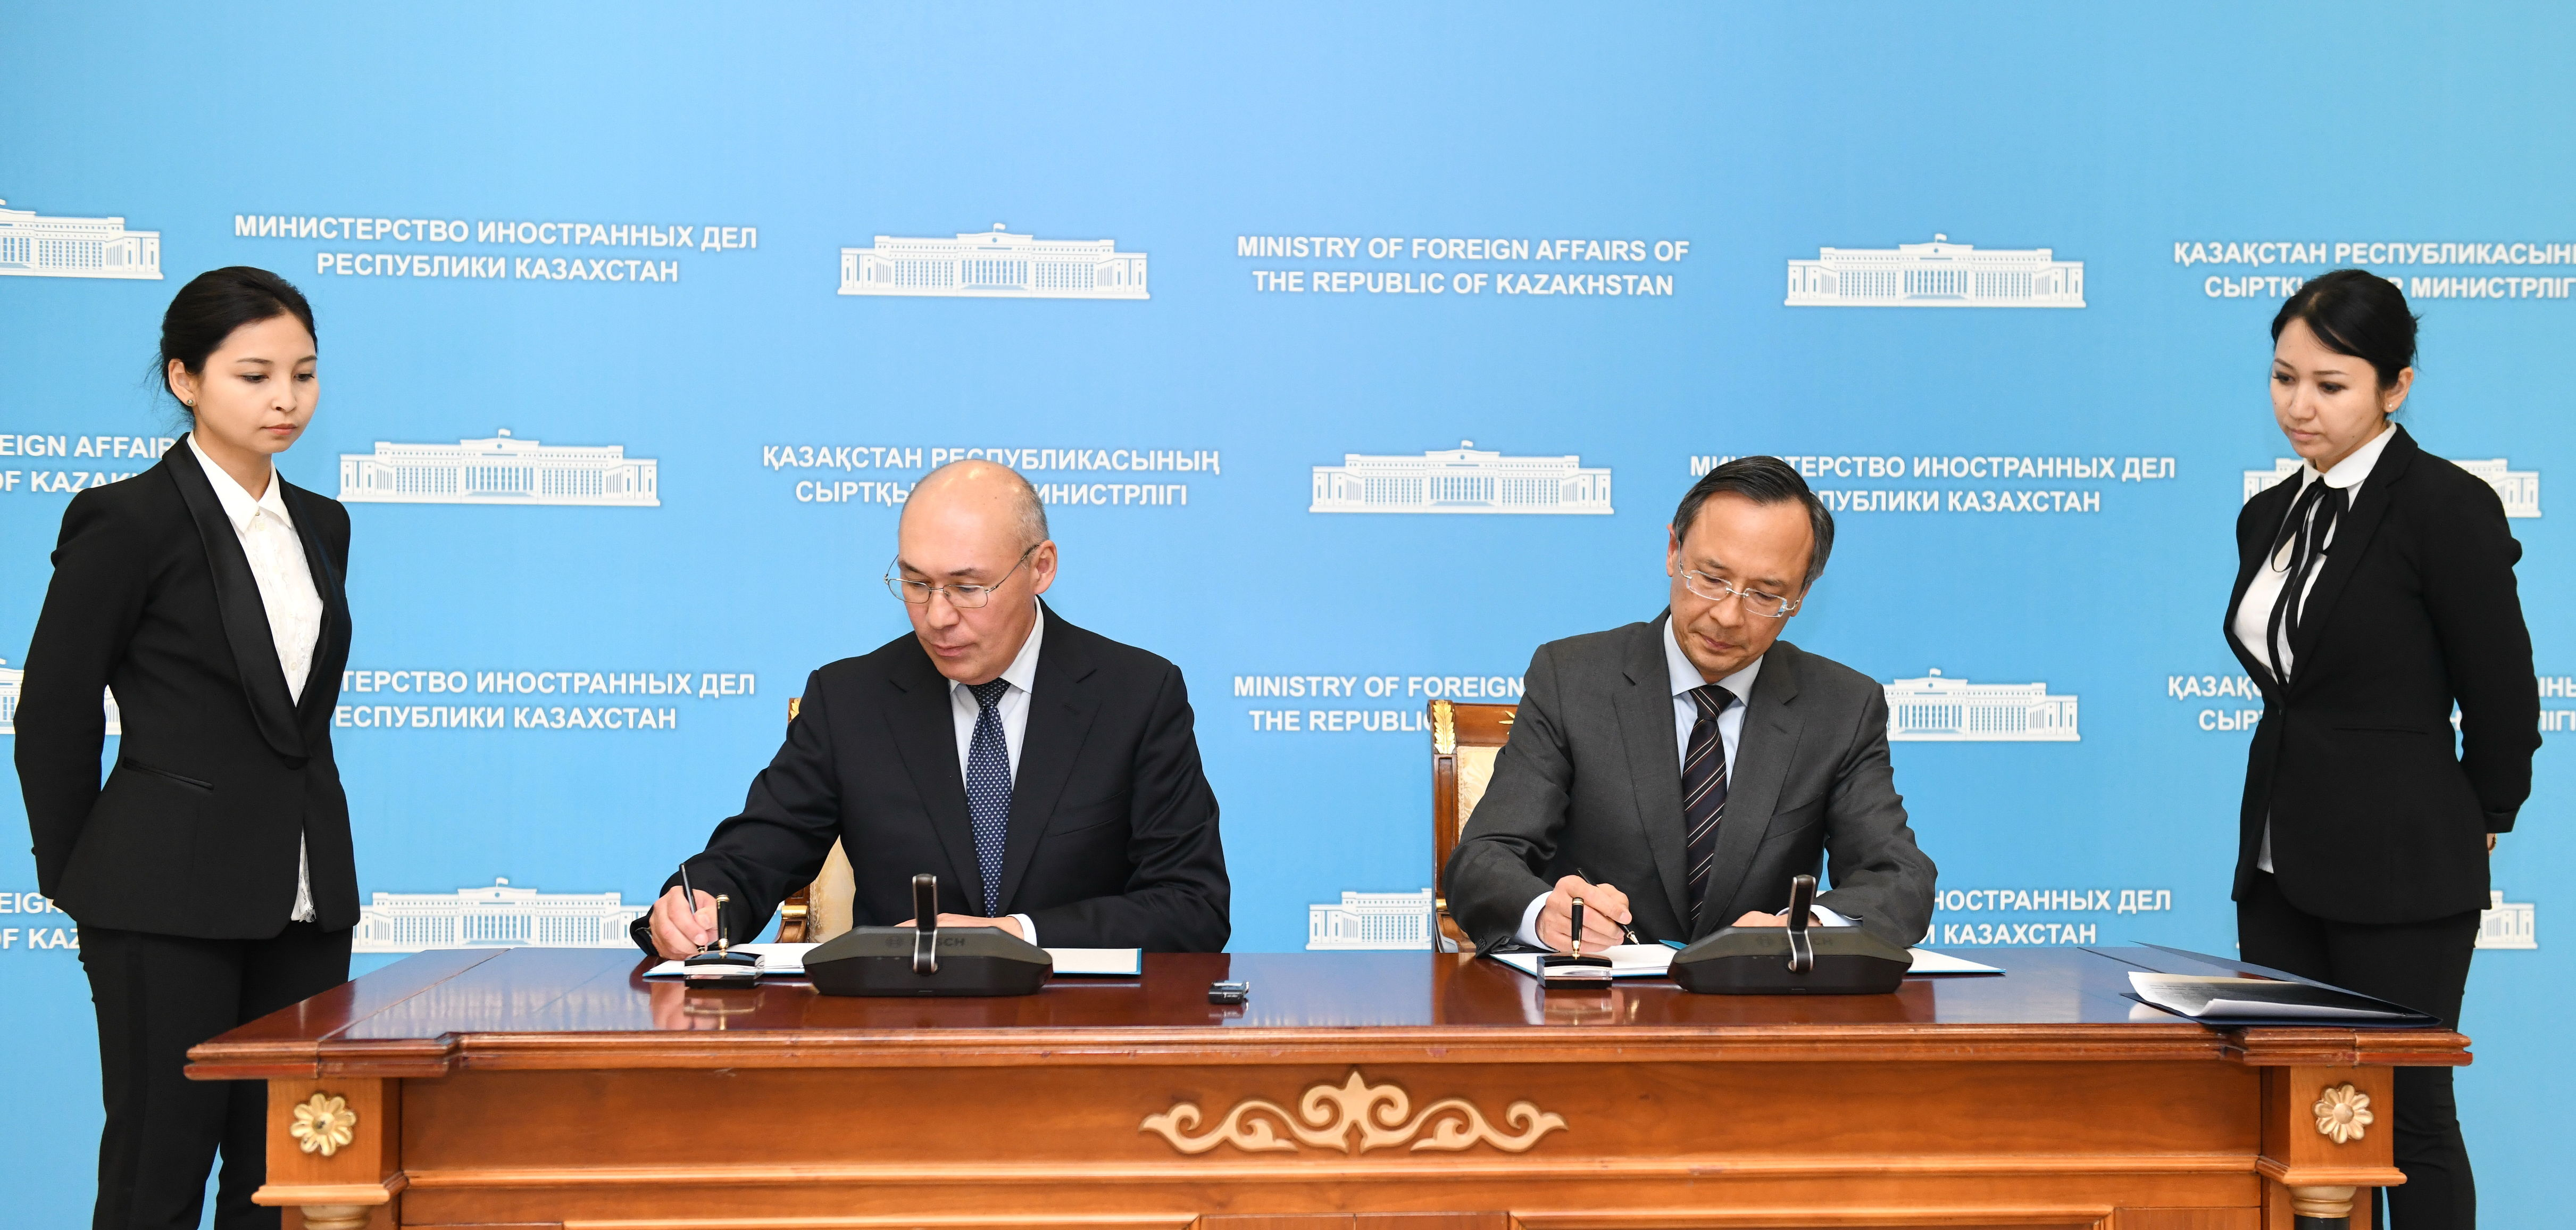 МИД и МФЦА приняли дорожную карту сотрудничества